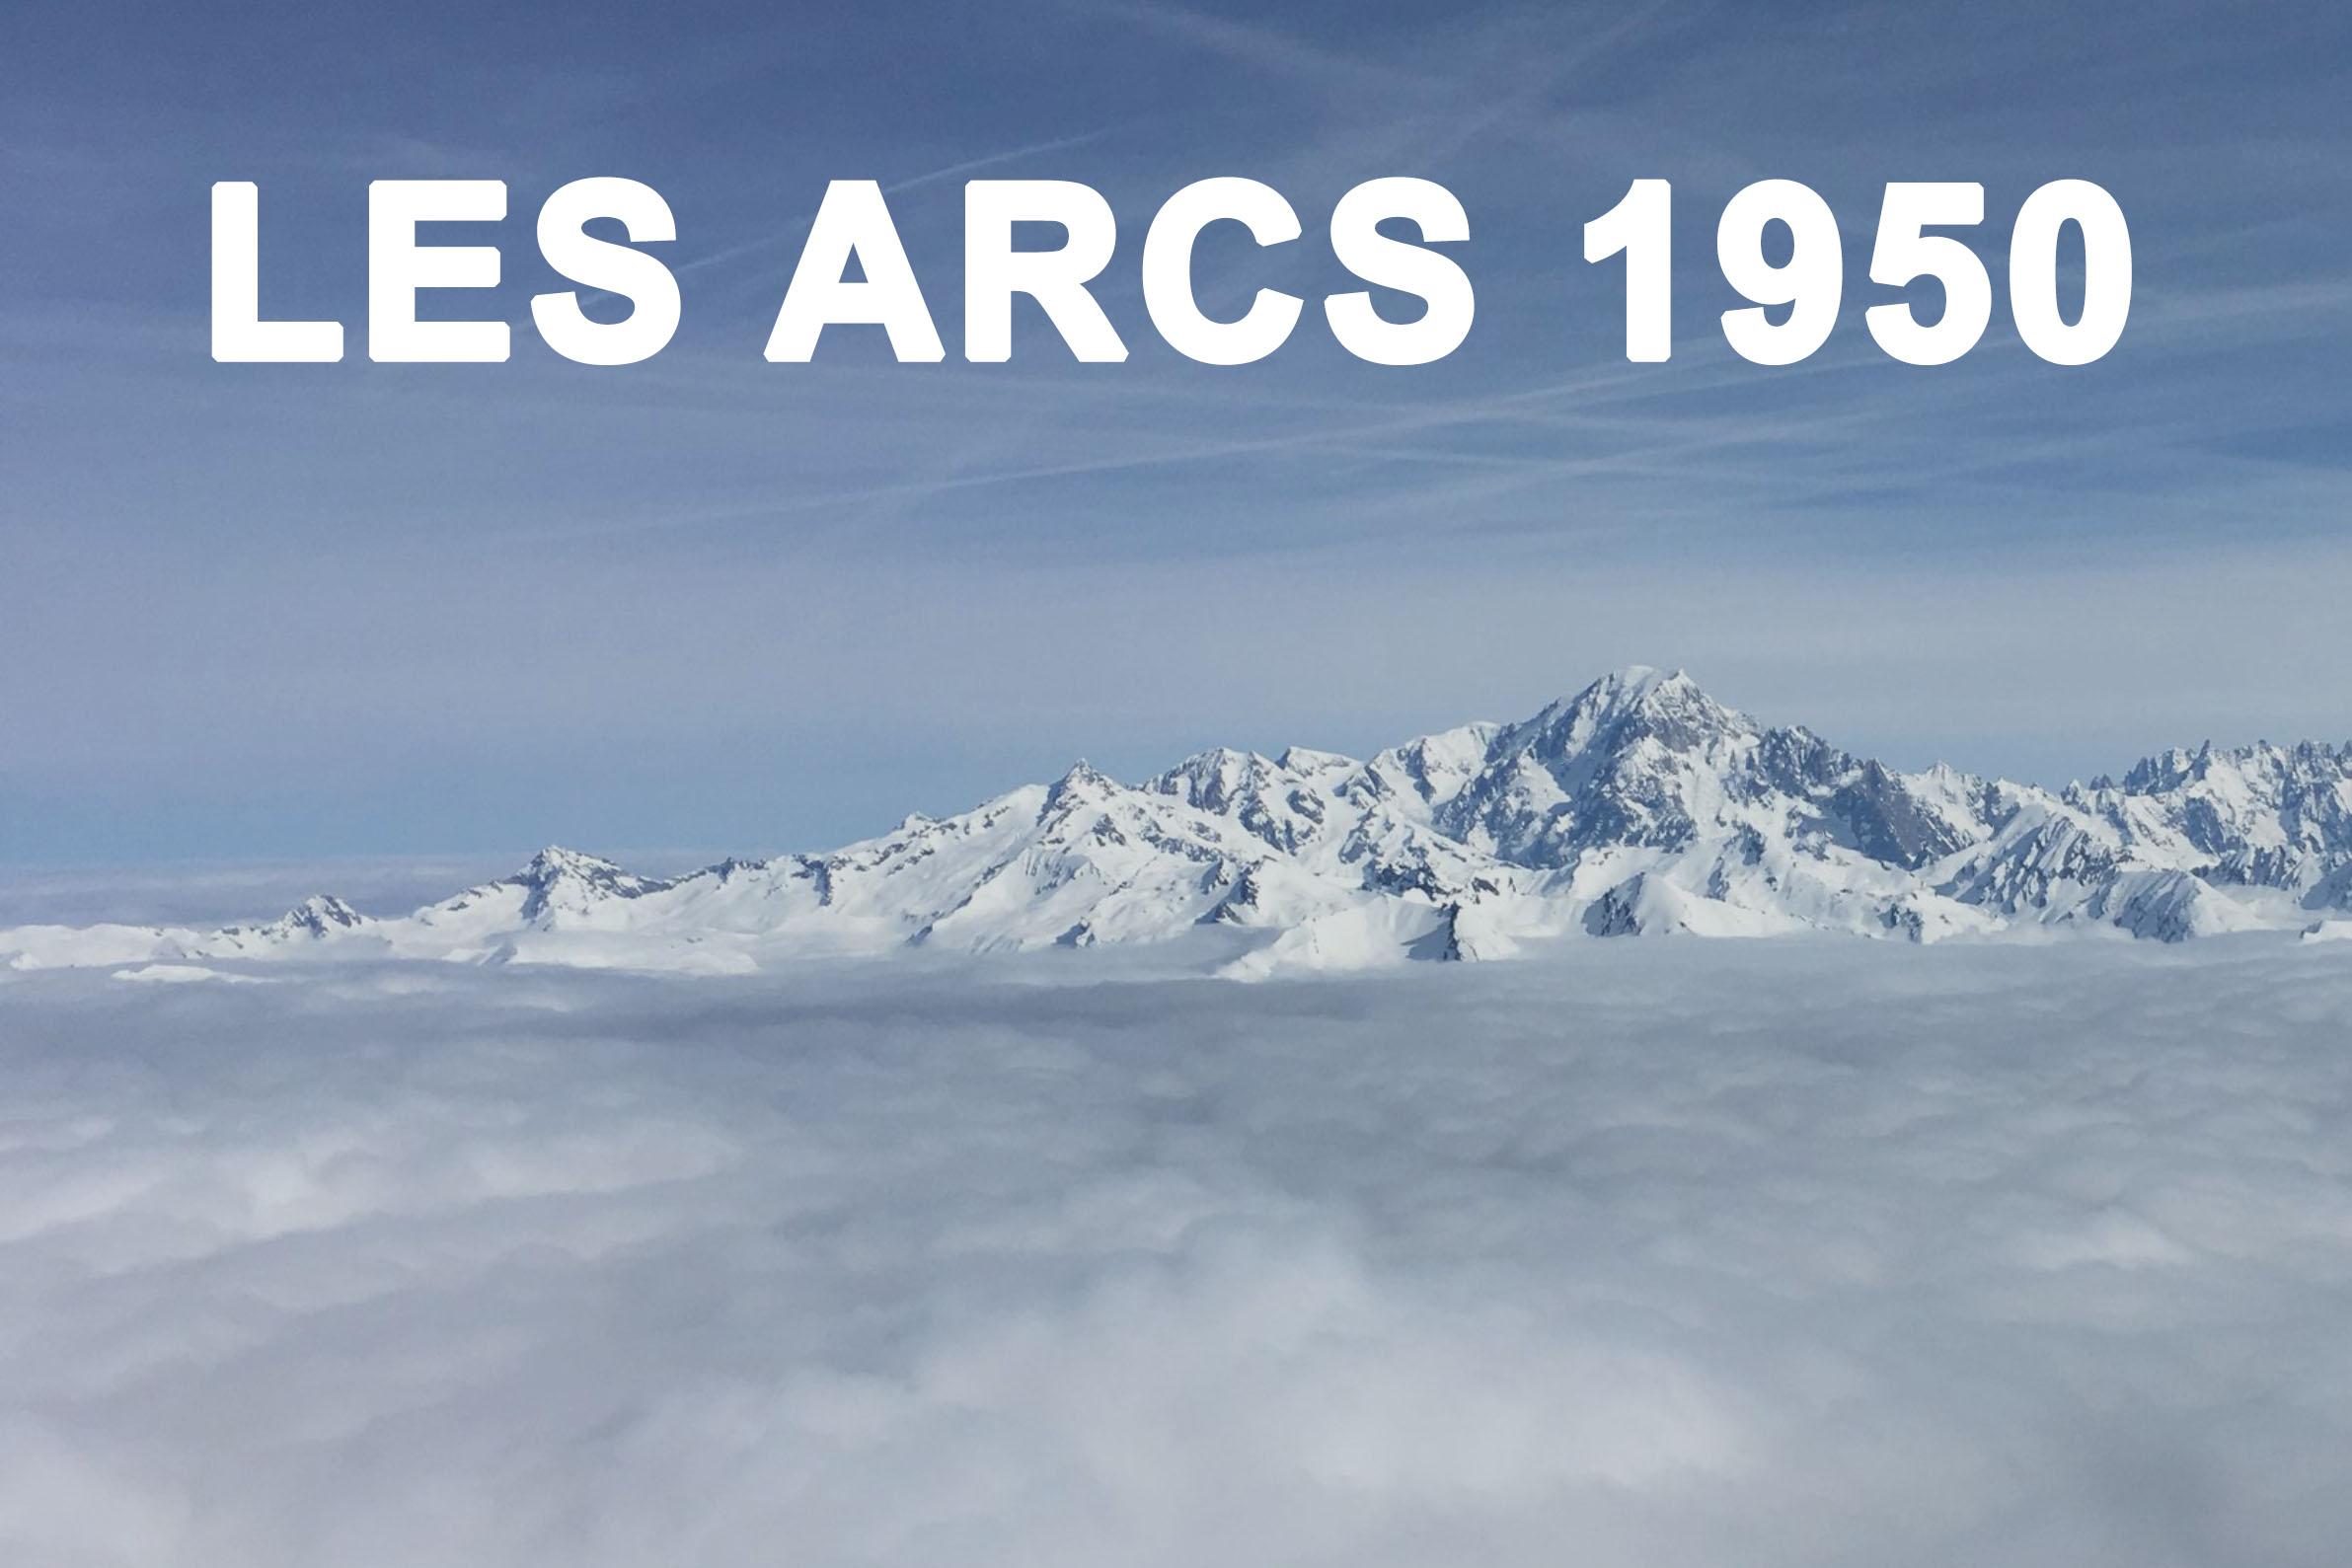 Les Arcs vignet.jpg